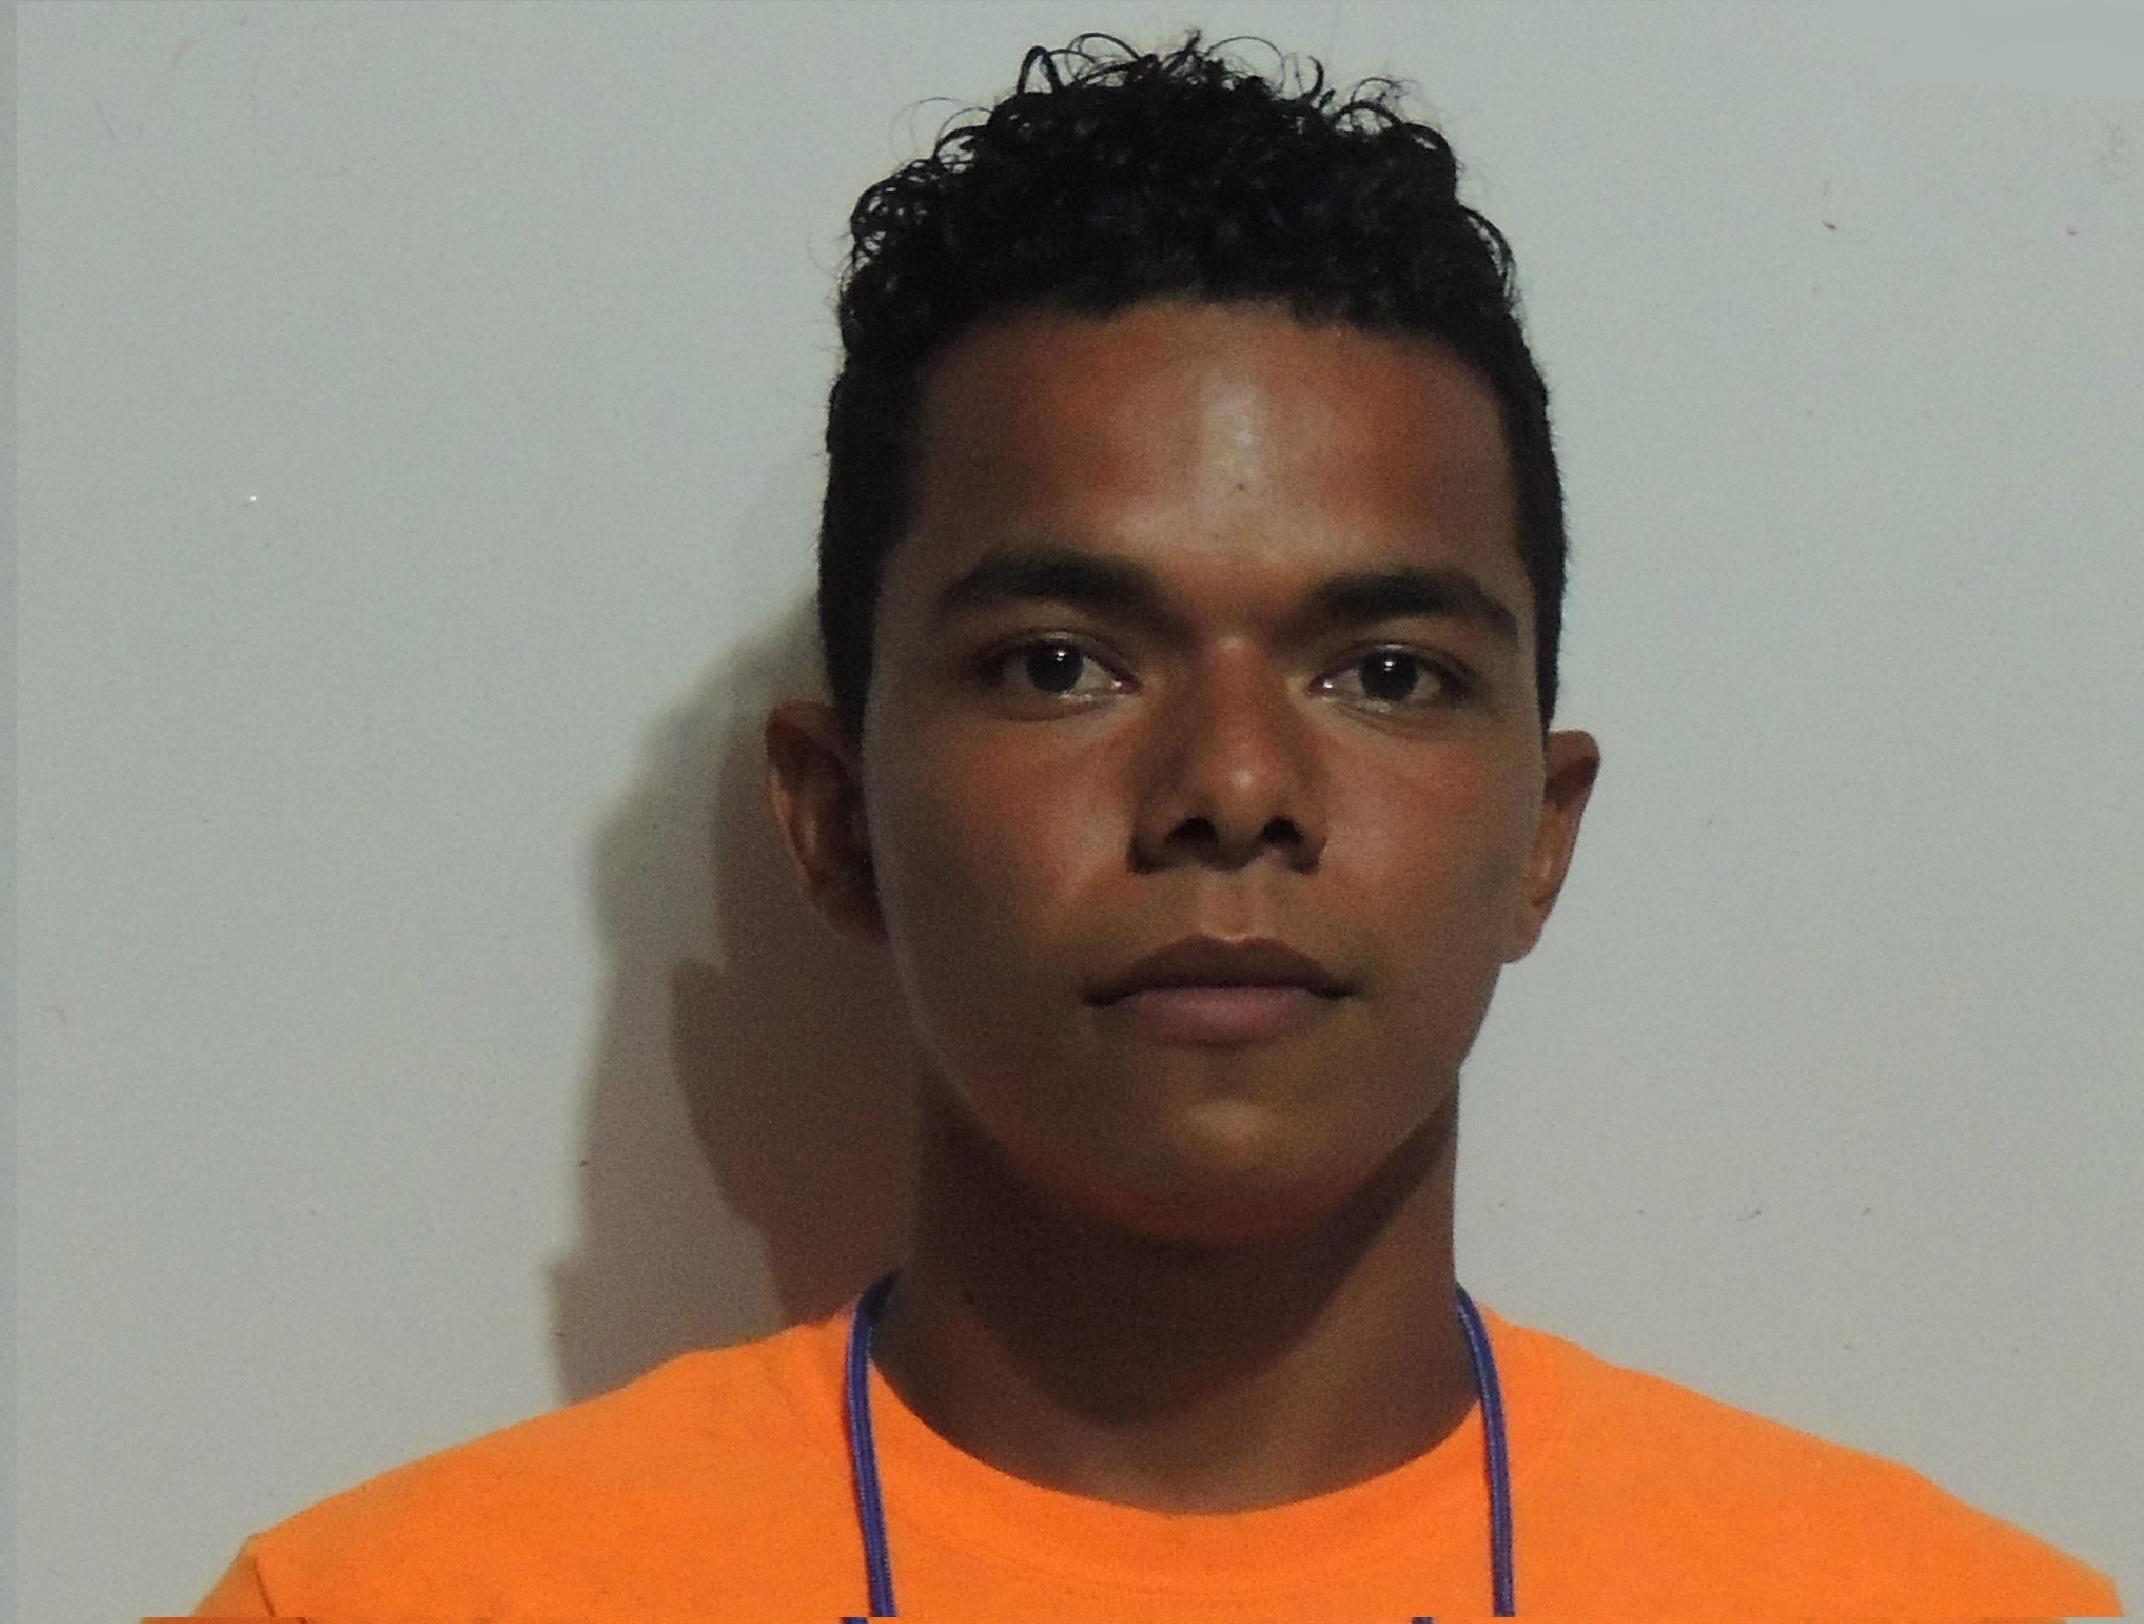 21 DENIS EDUARDO JIMENEZ RANGEL.jpg